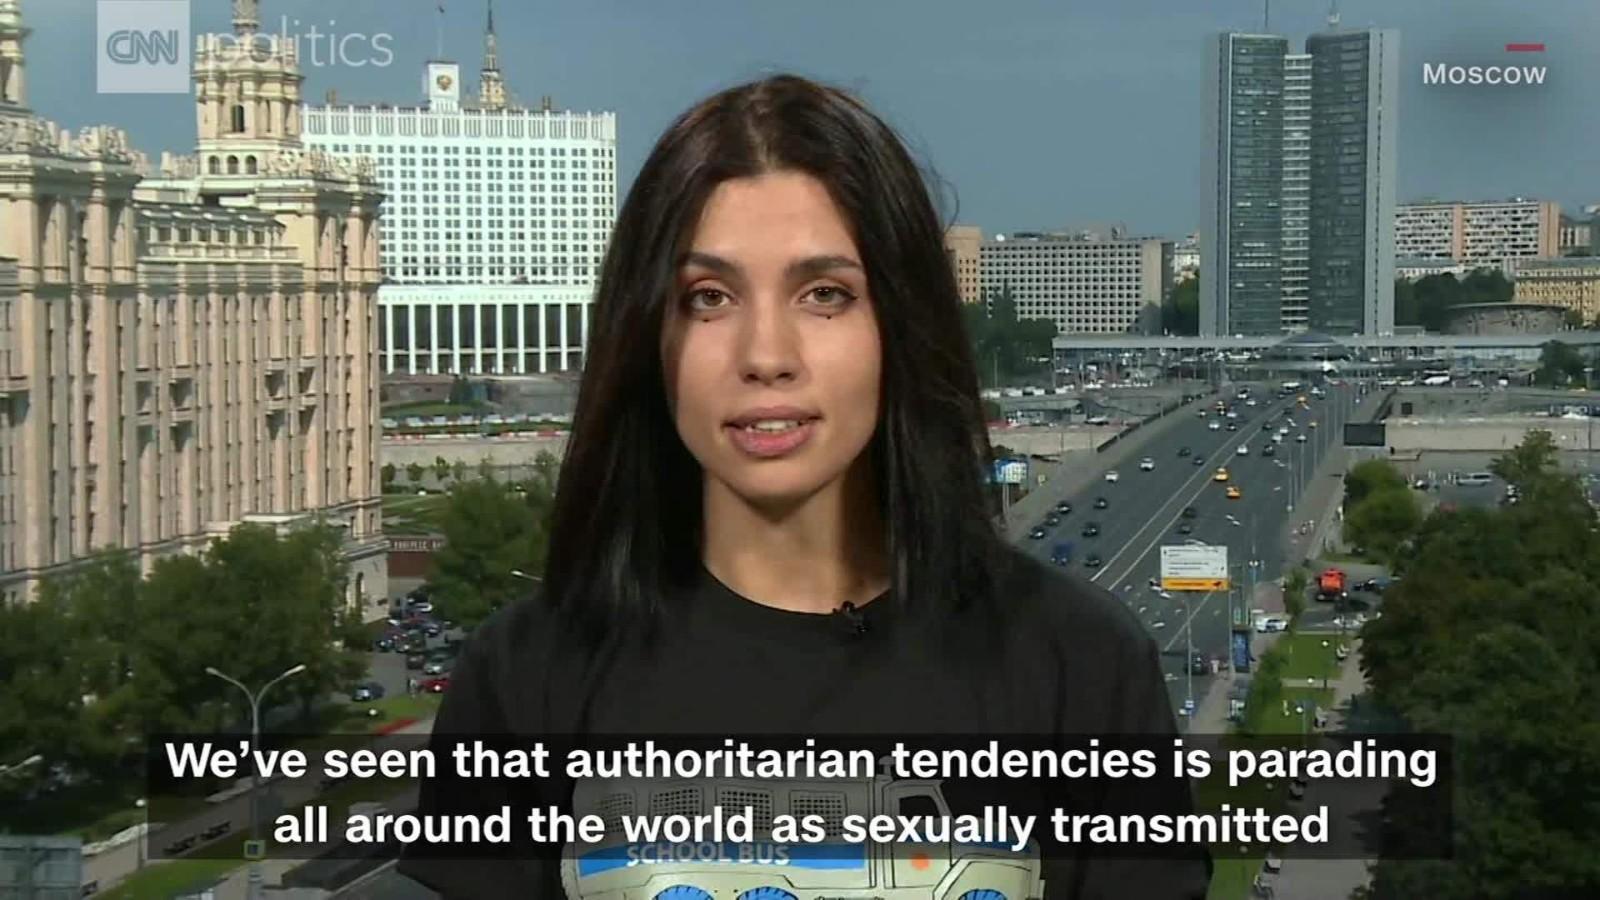 riot tolokonnikova Pussy nadezhda